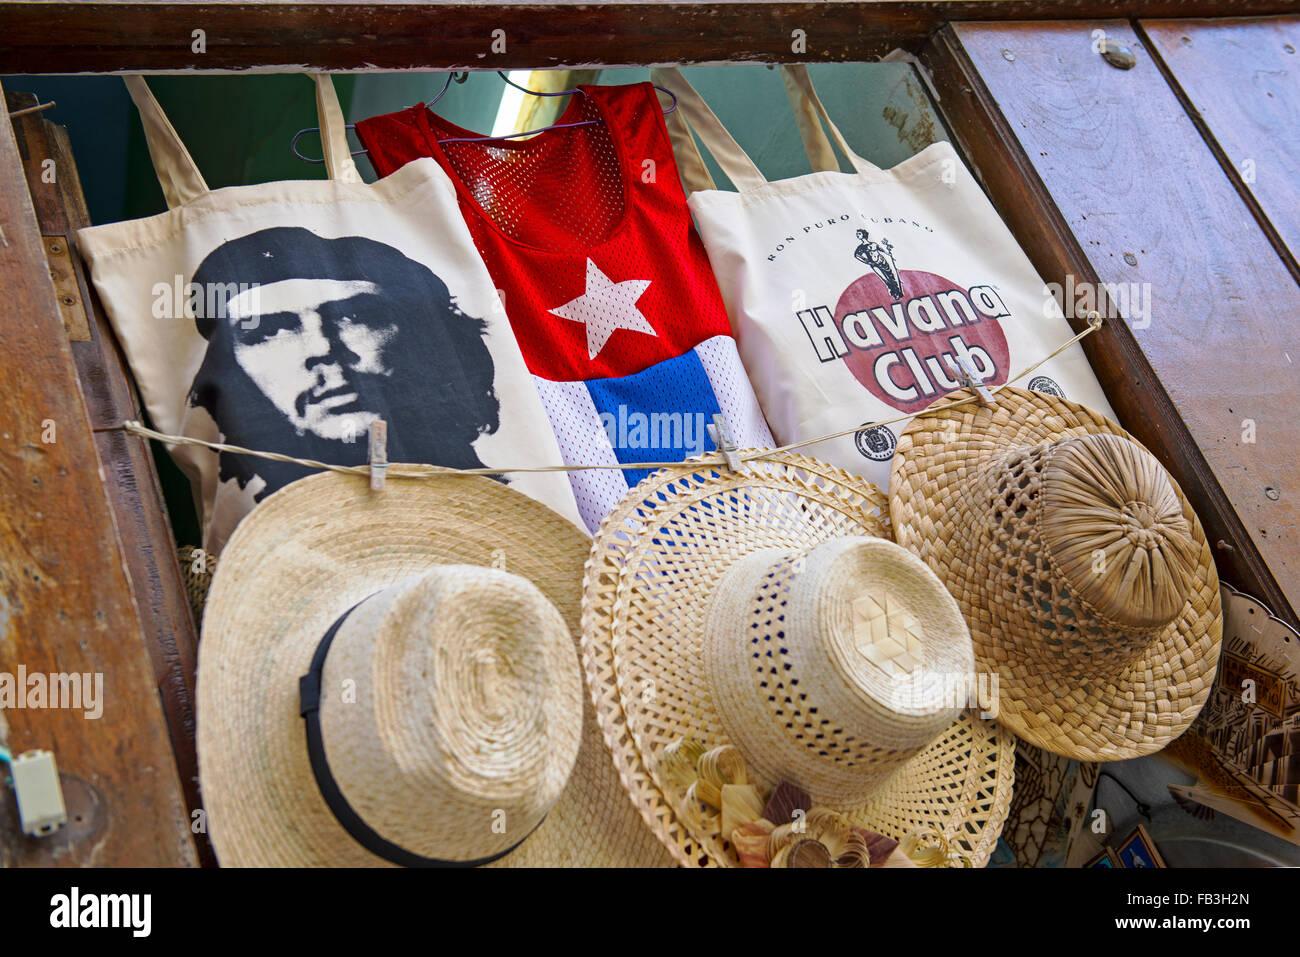 Cuba Souvenirs, Hats T-shirts Che Guevara - Stock Image